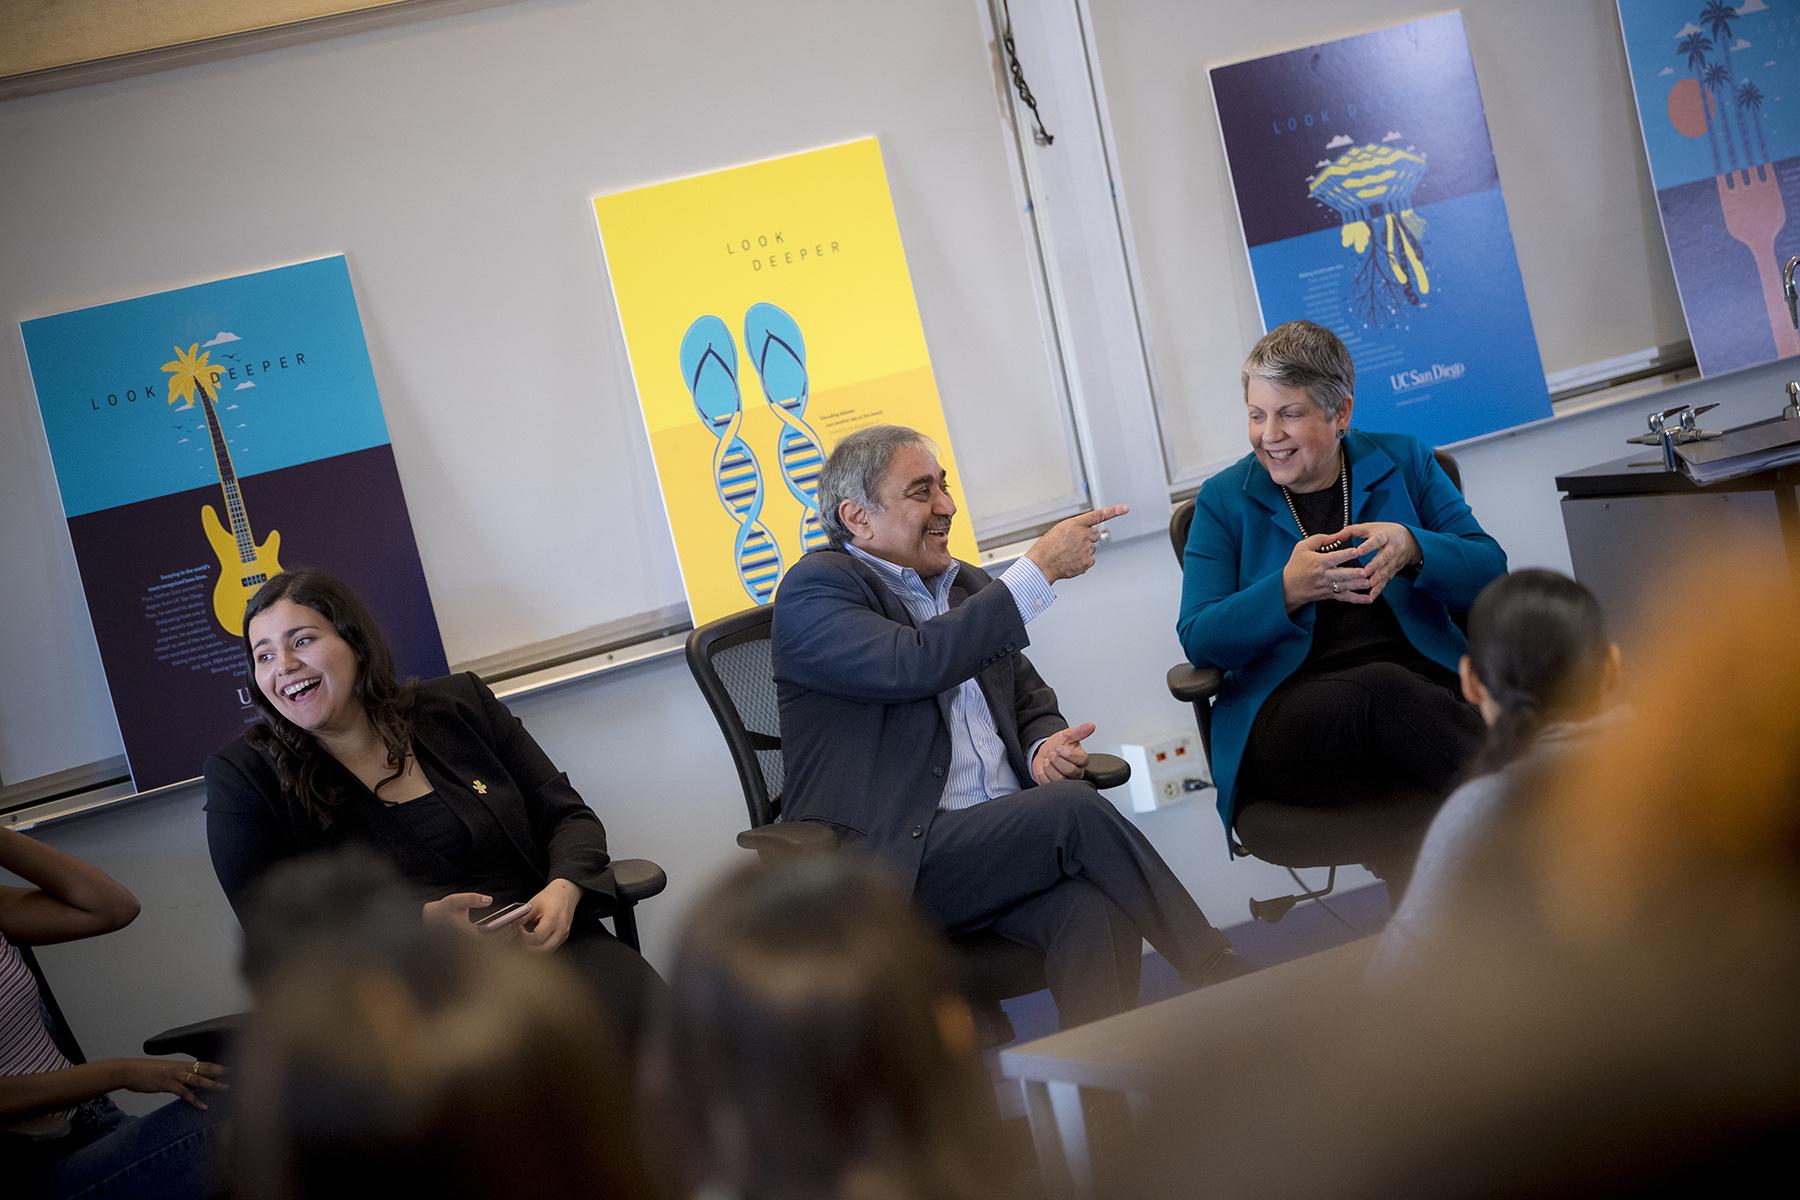 Chancellor Khosla and University of California President Janet Napolitano speak to high school students.